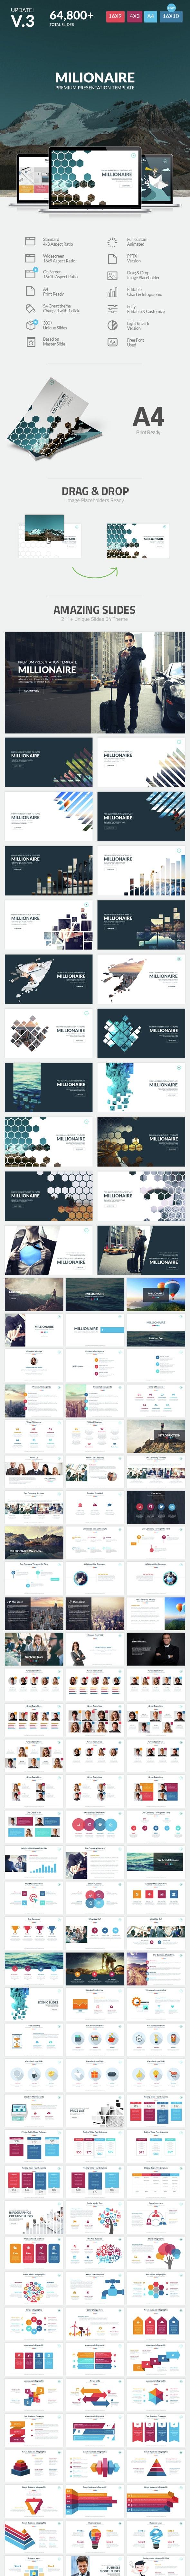 Millionaire - Premium Powerpoint Template - Business PowerPoint Templates